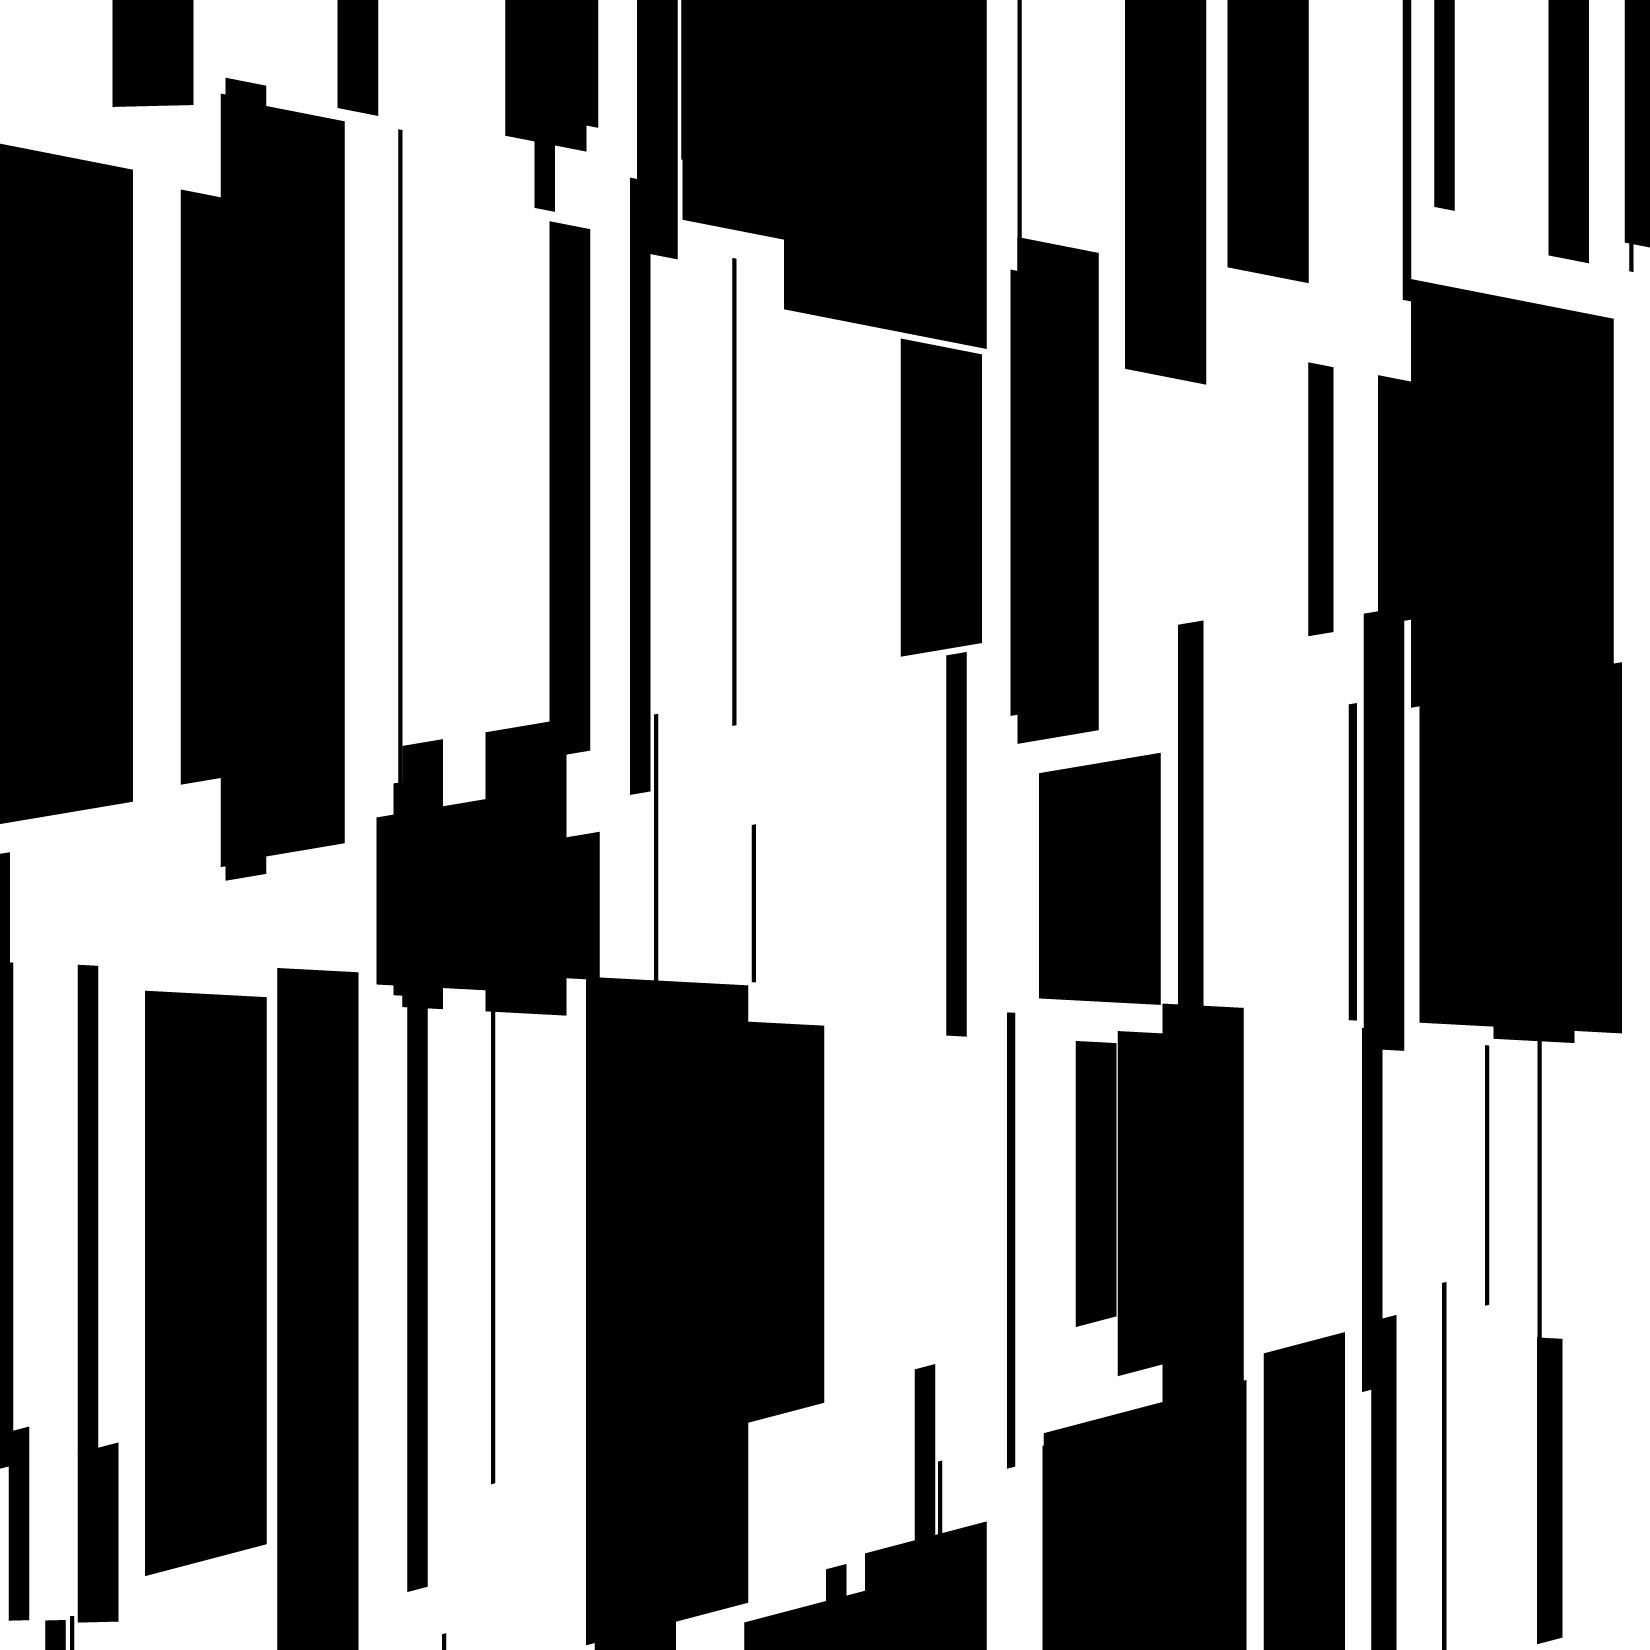 Barcode Distort-01.png